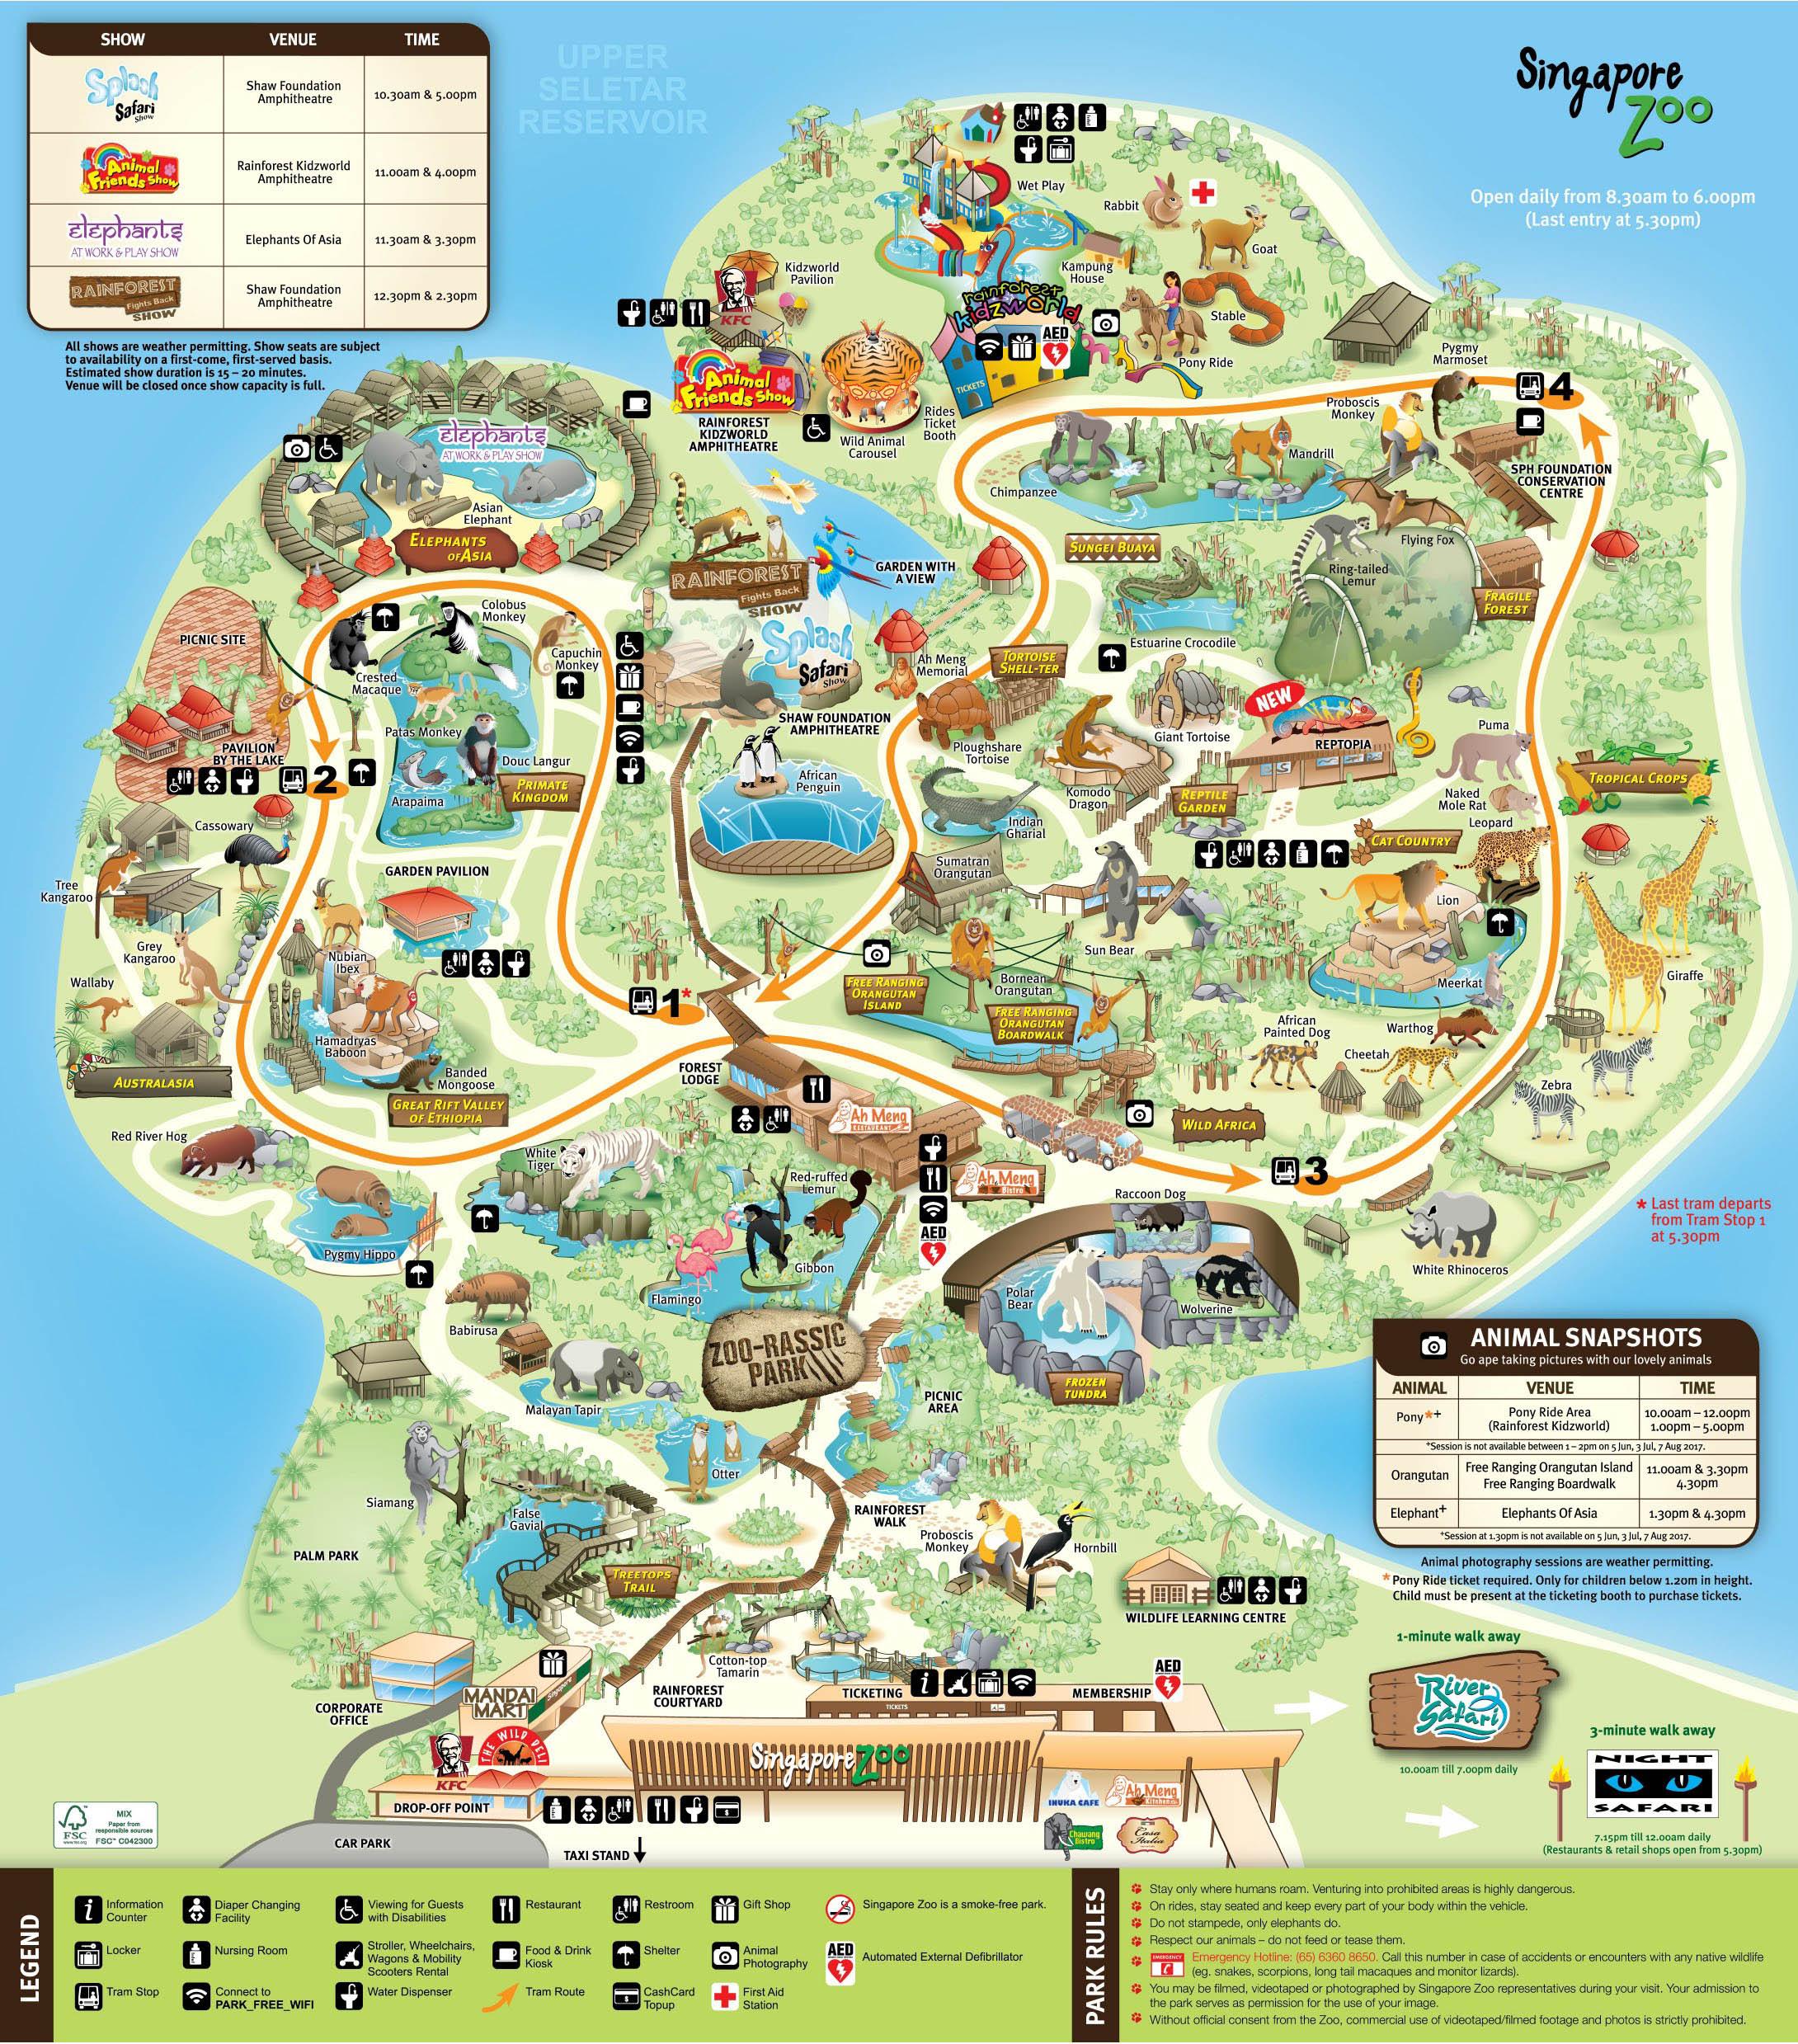 карта схема зоопарка в сингапуре